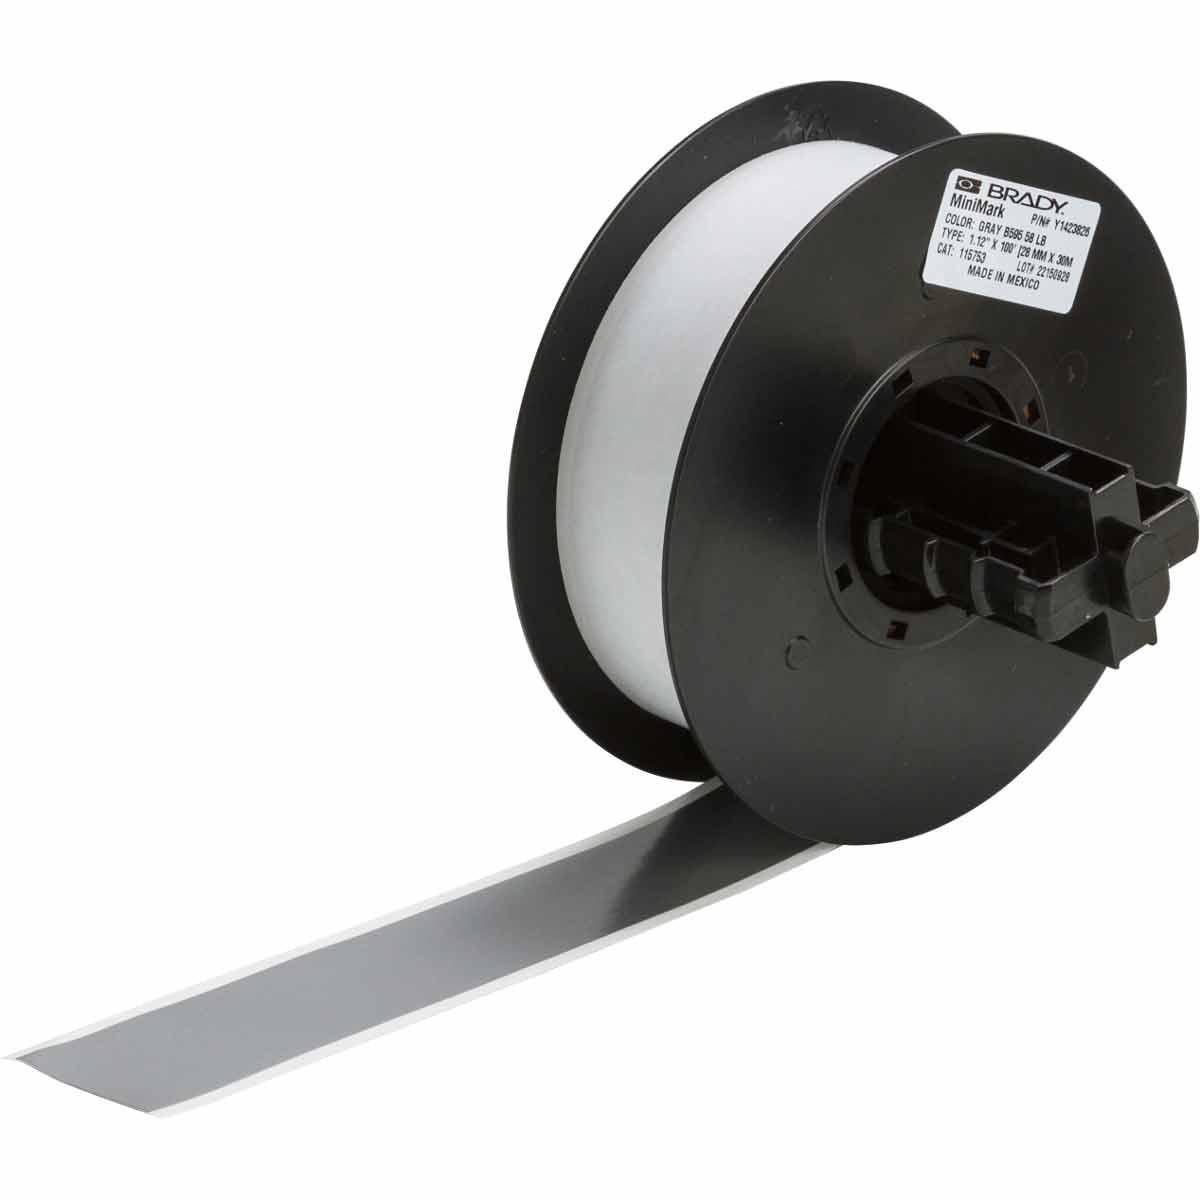 brady part 115753 minimark series indoor outdoor vinyl labels. Black Bedroom Furniture Sets. Home Design Ideas